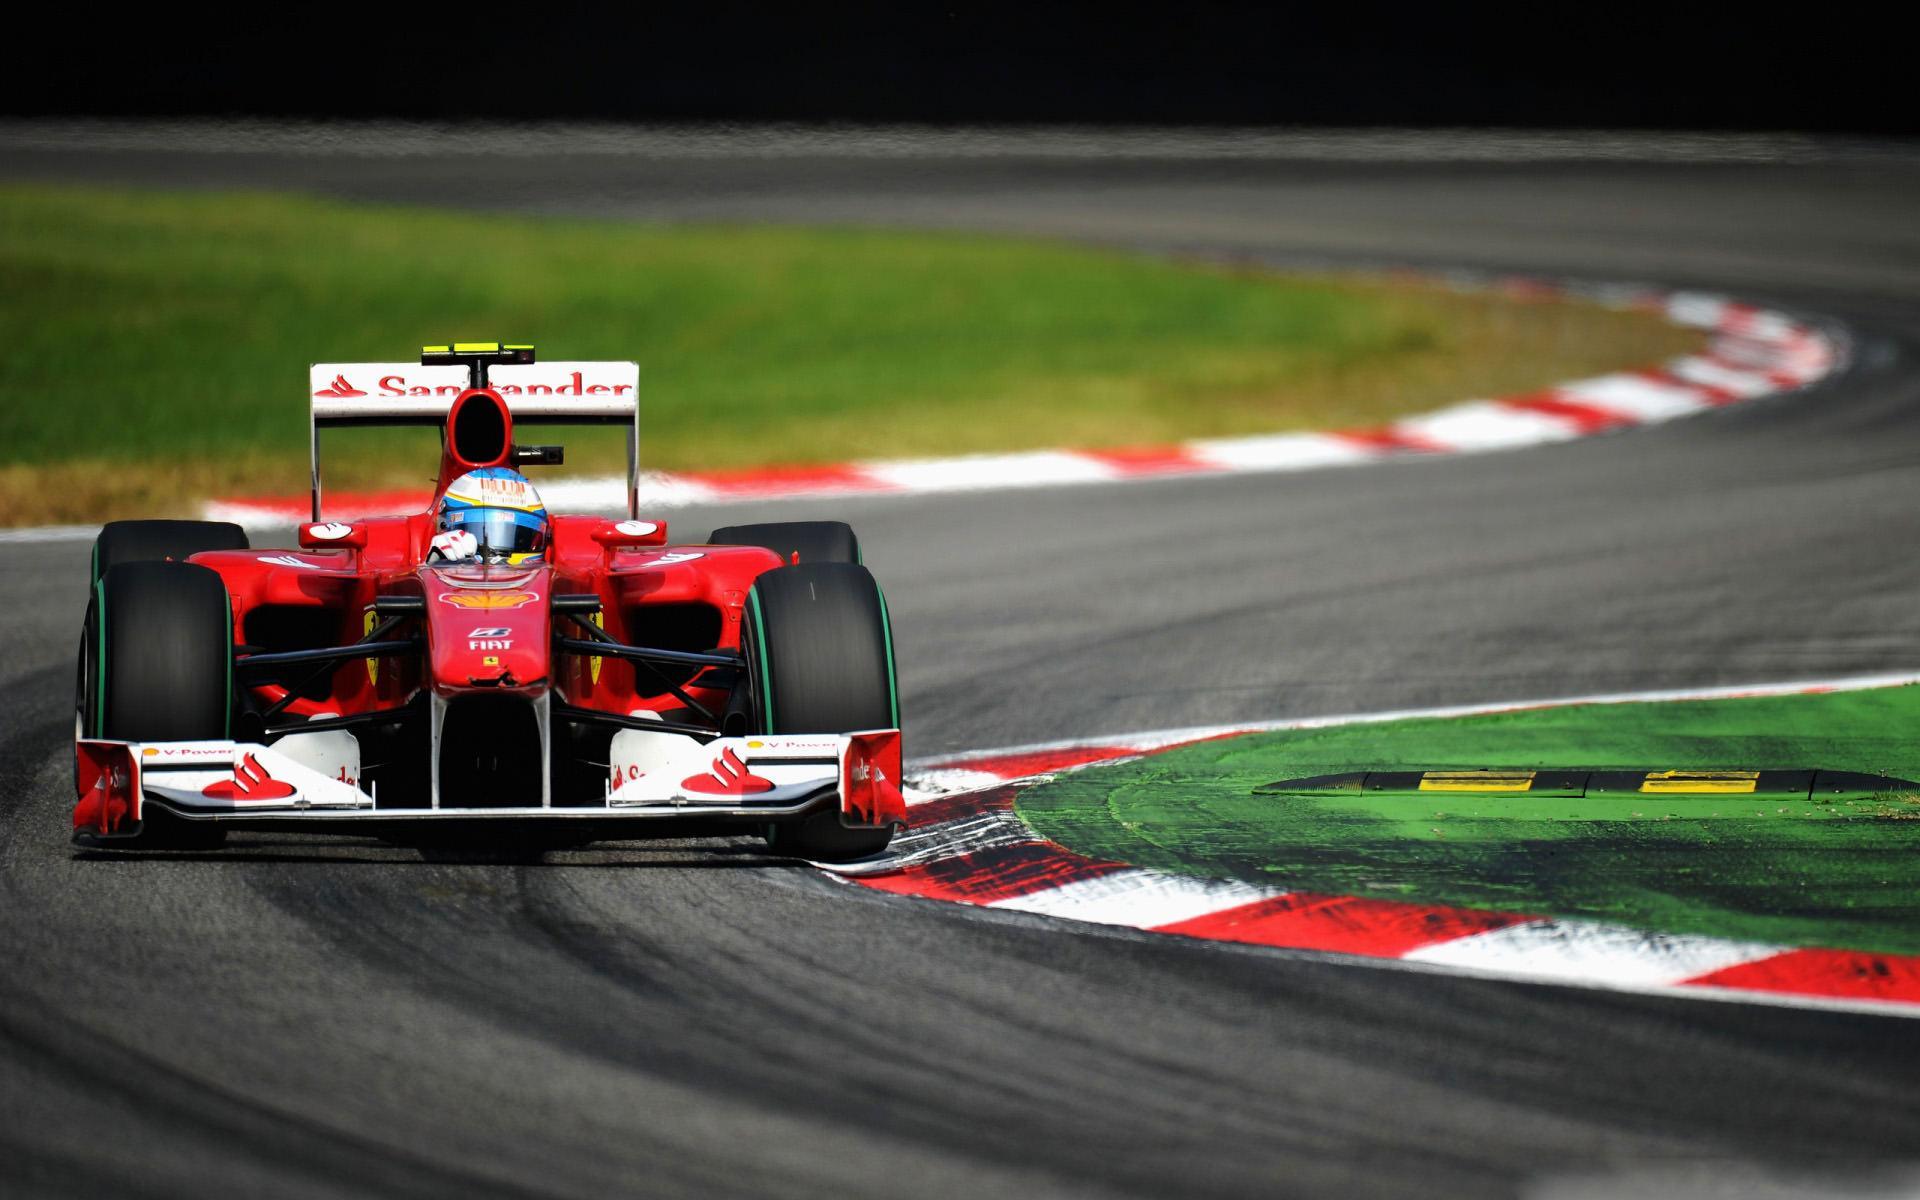 Ferrari F1 Wallpapers Top Free Ferrari F1 Backgrounds Wallpaperaccess